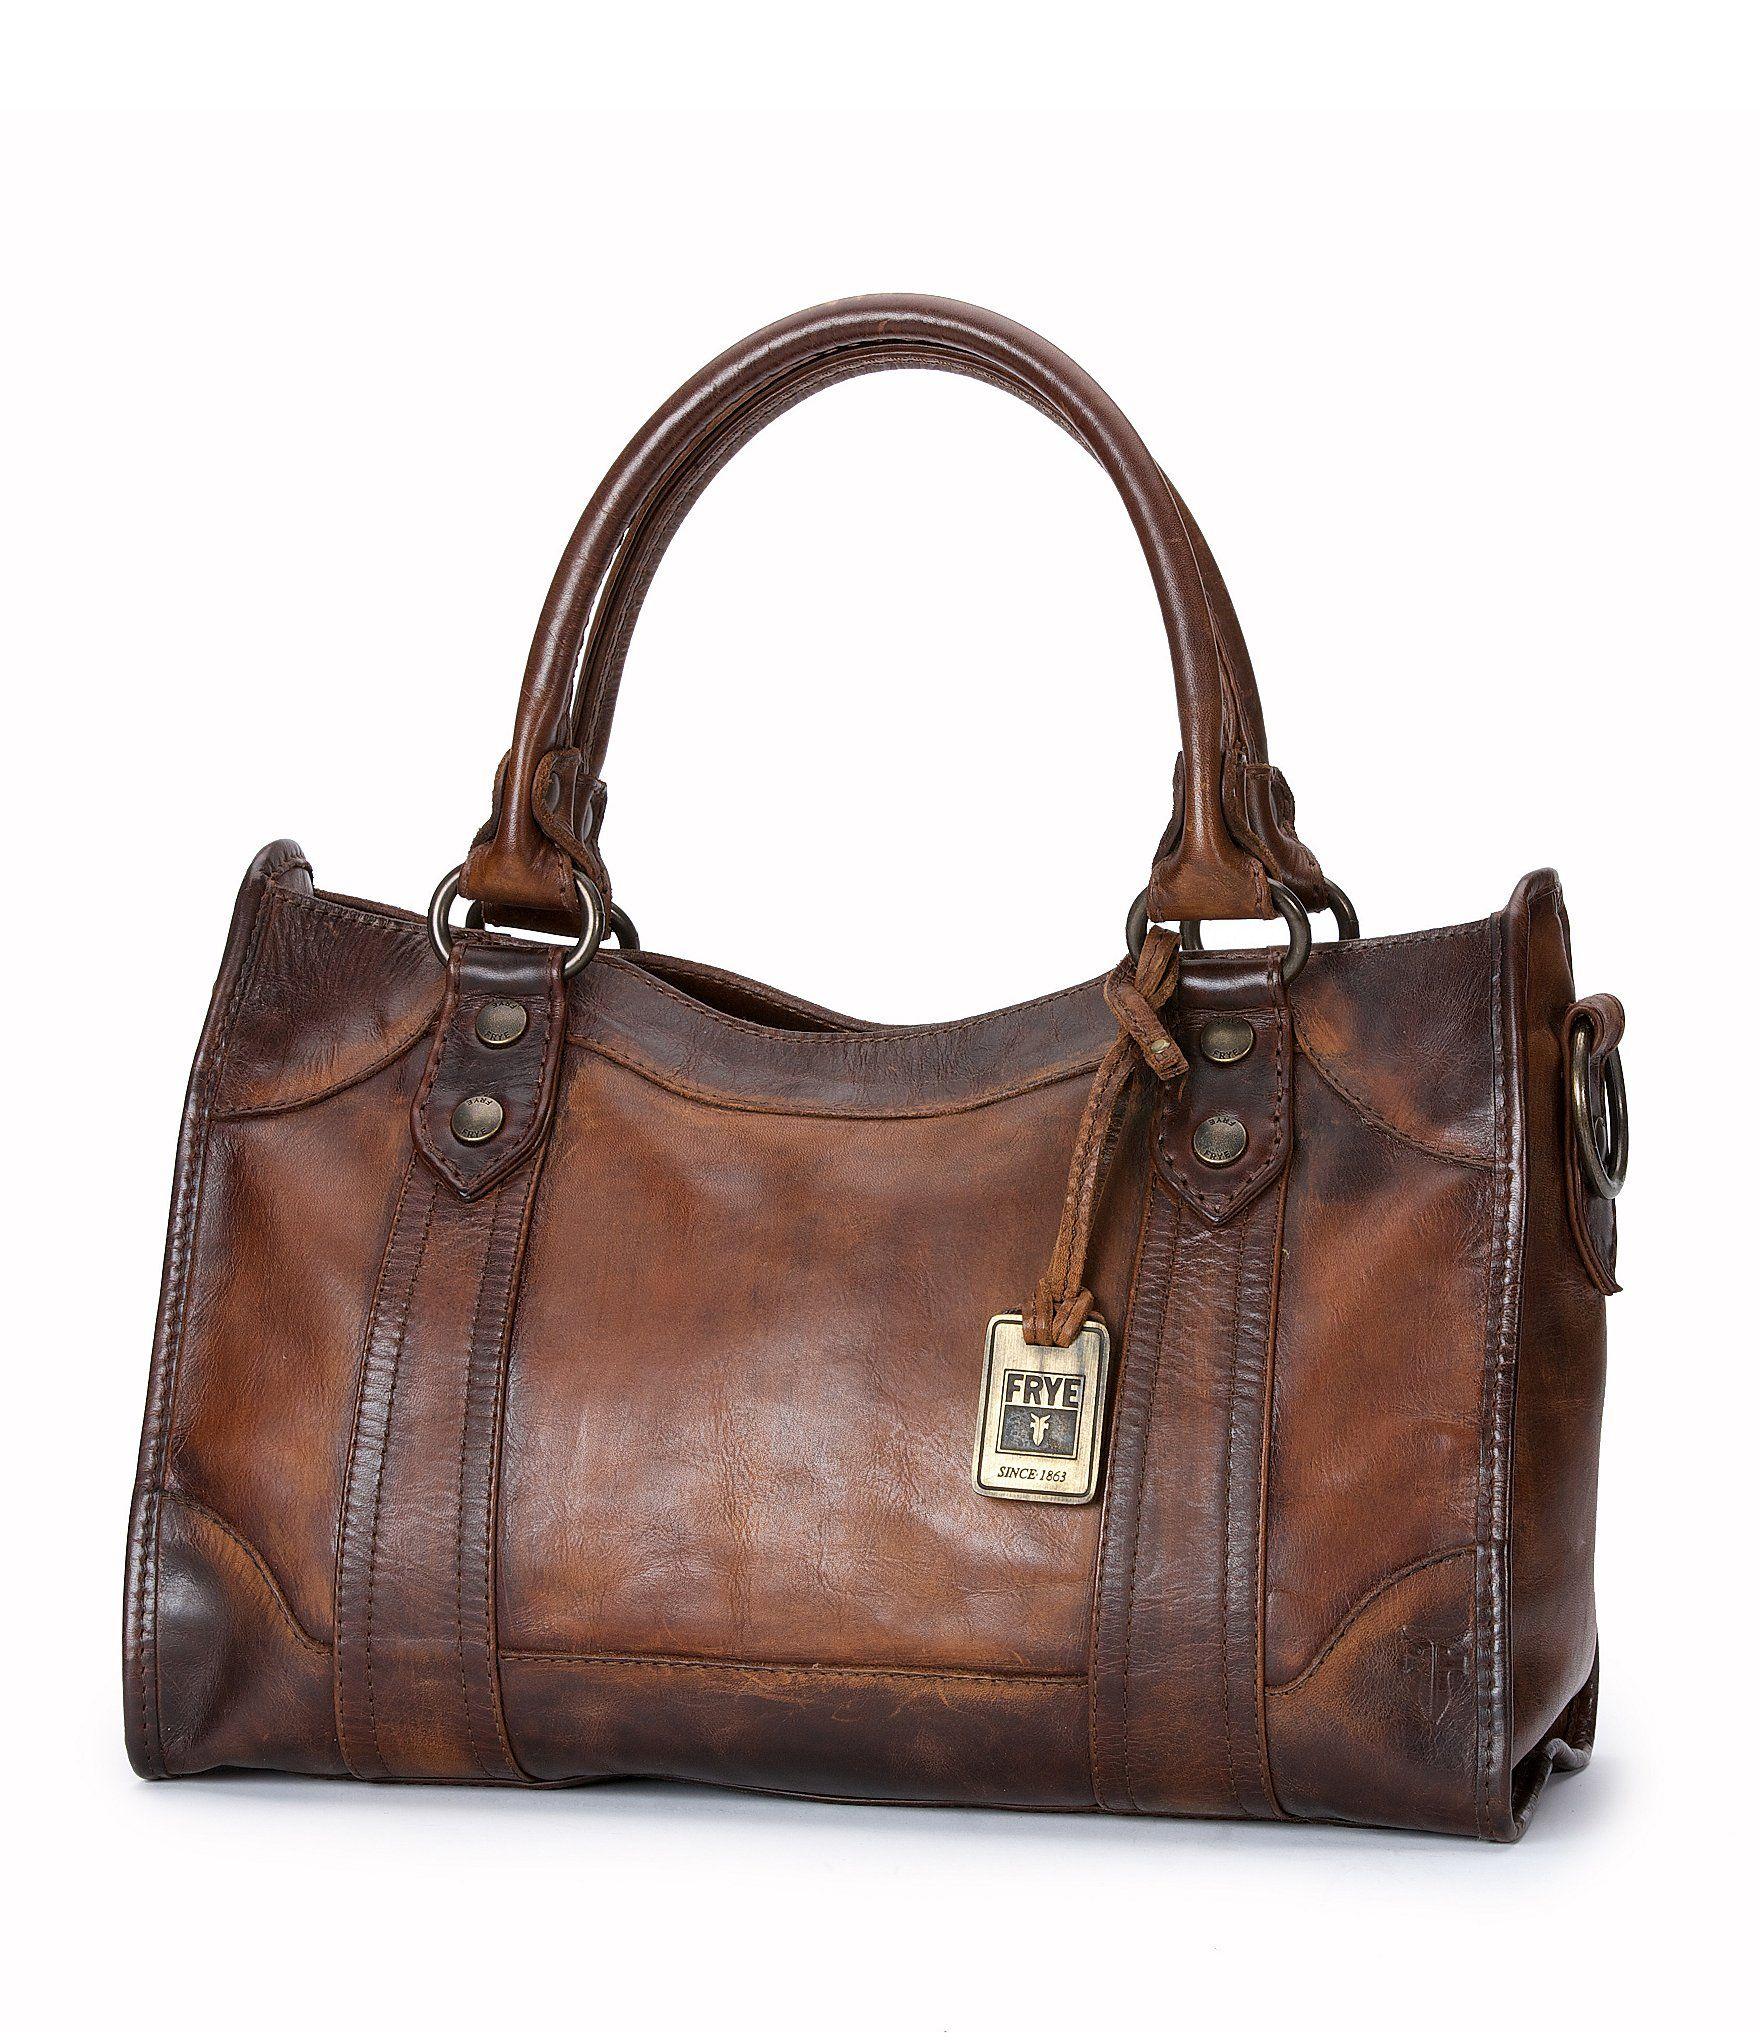 ce64f7095b3 Frye Melissa Washed Leather Satchel